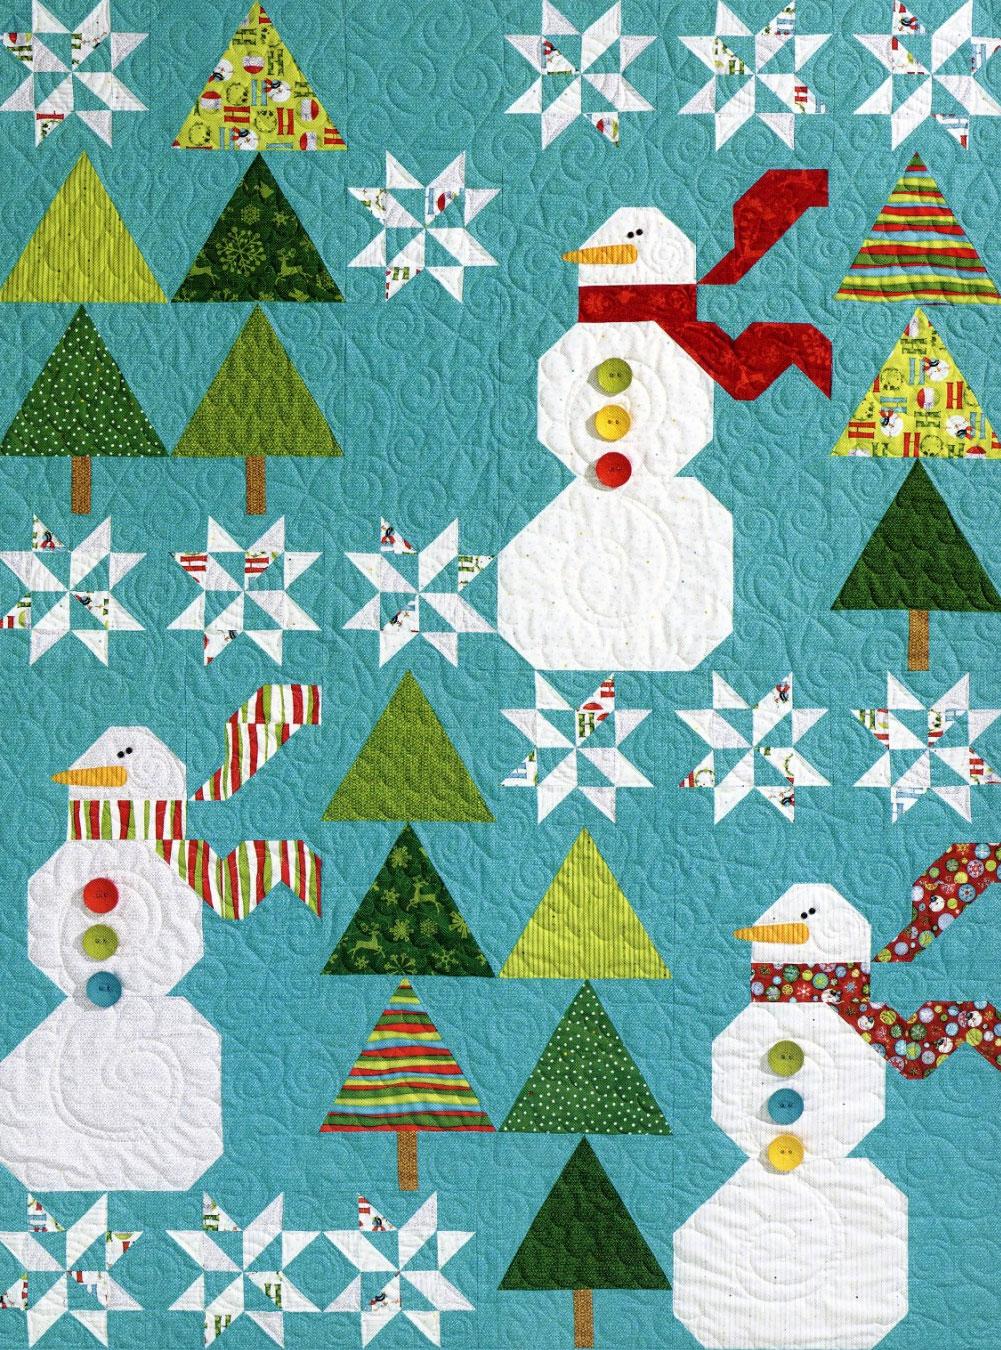 Ho-Ho-Ho-Let-It-Snow-sewing-book-Art-To-Heart-1